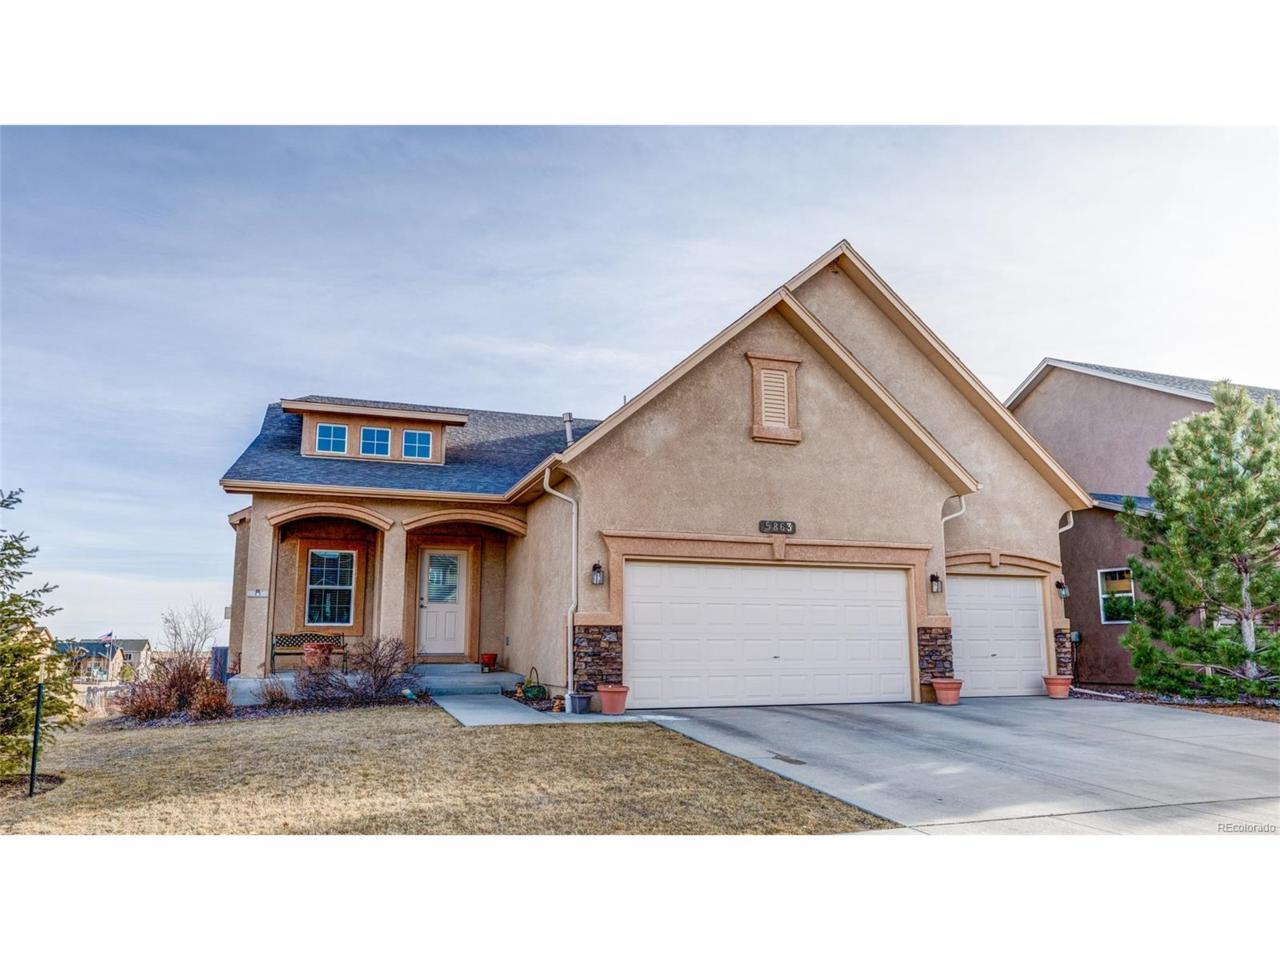 5863 Yancey Drive, Colorado Springs, CO 80924 (MLS #3310041) :: 8z Real Estate